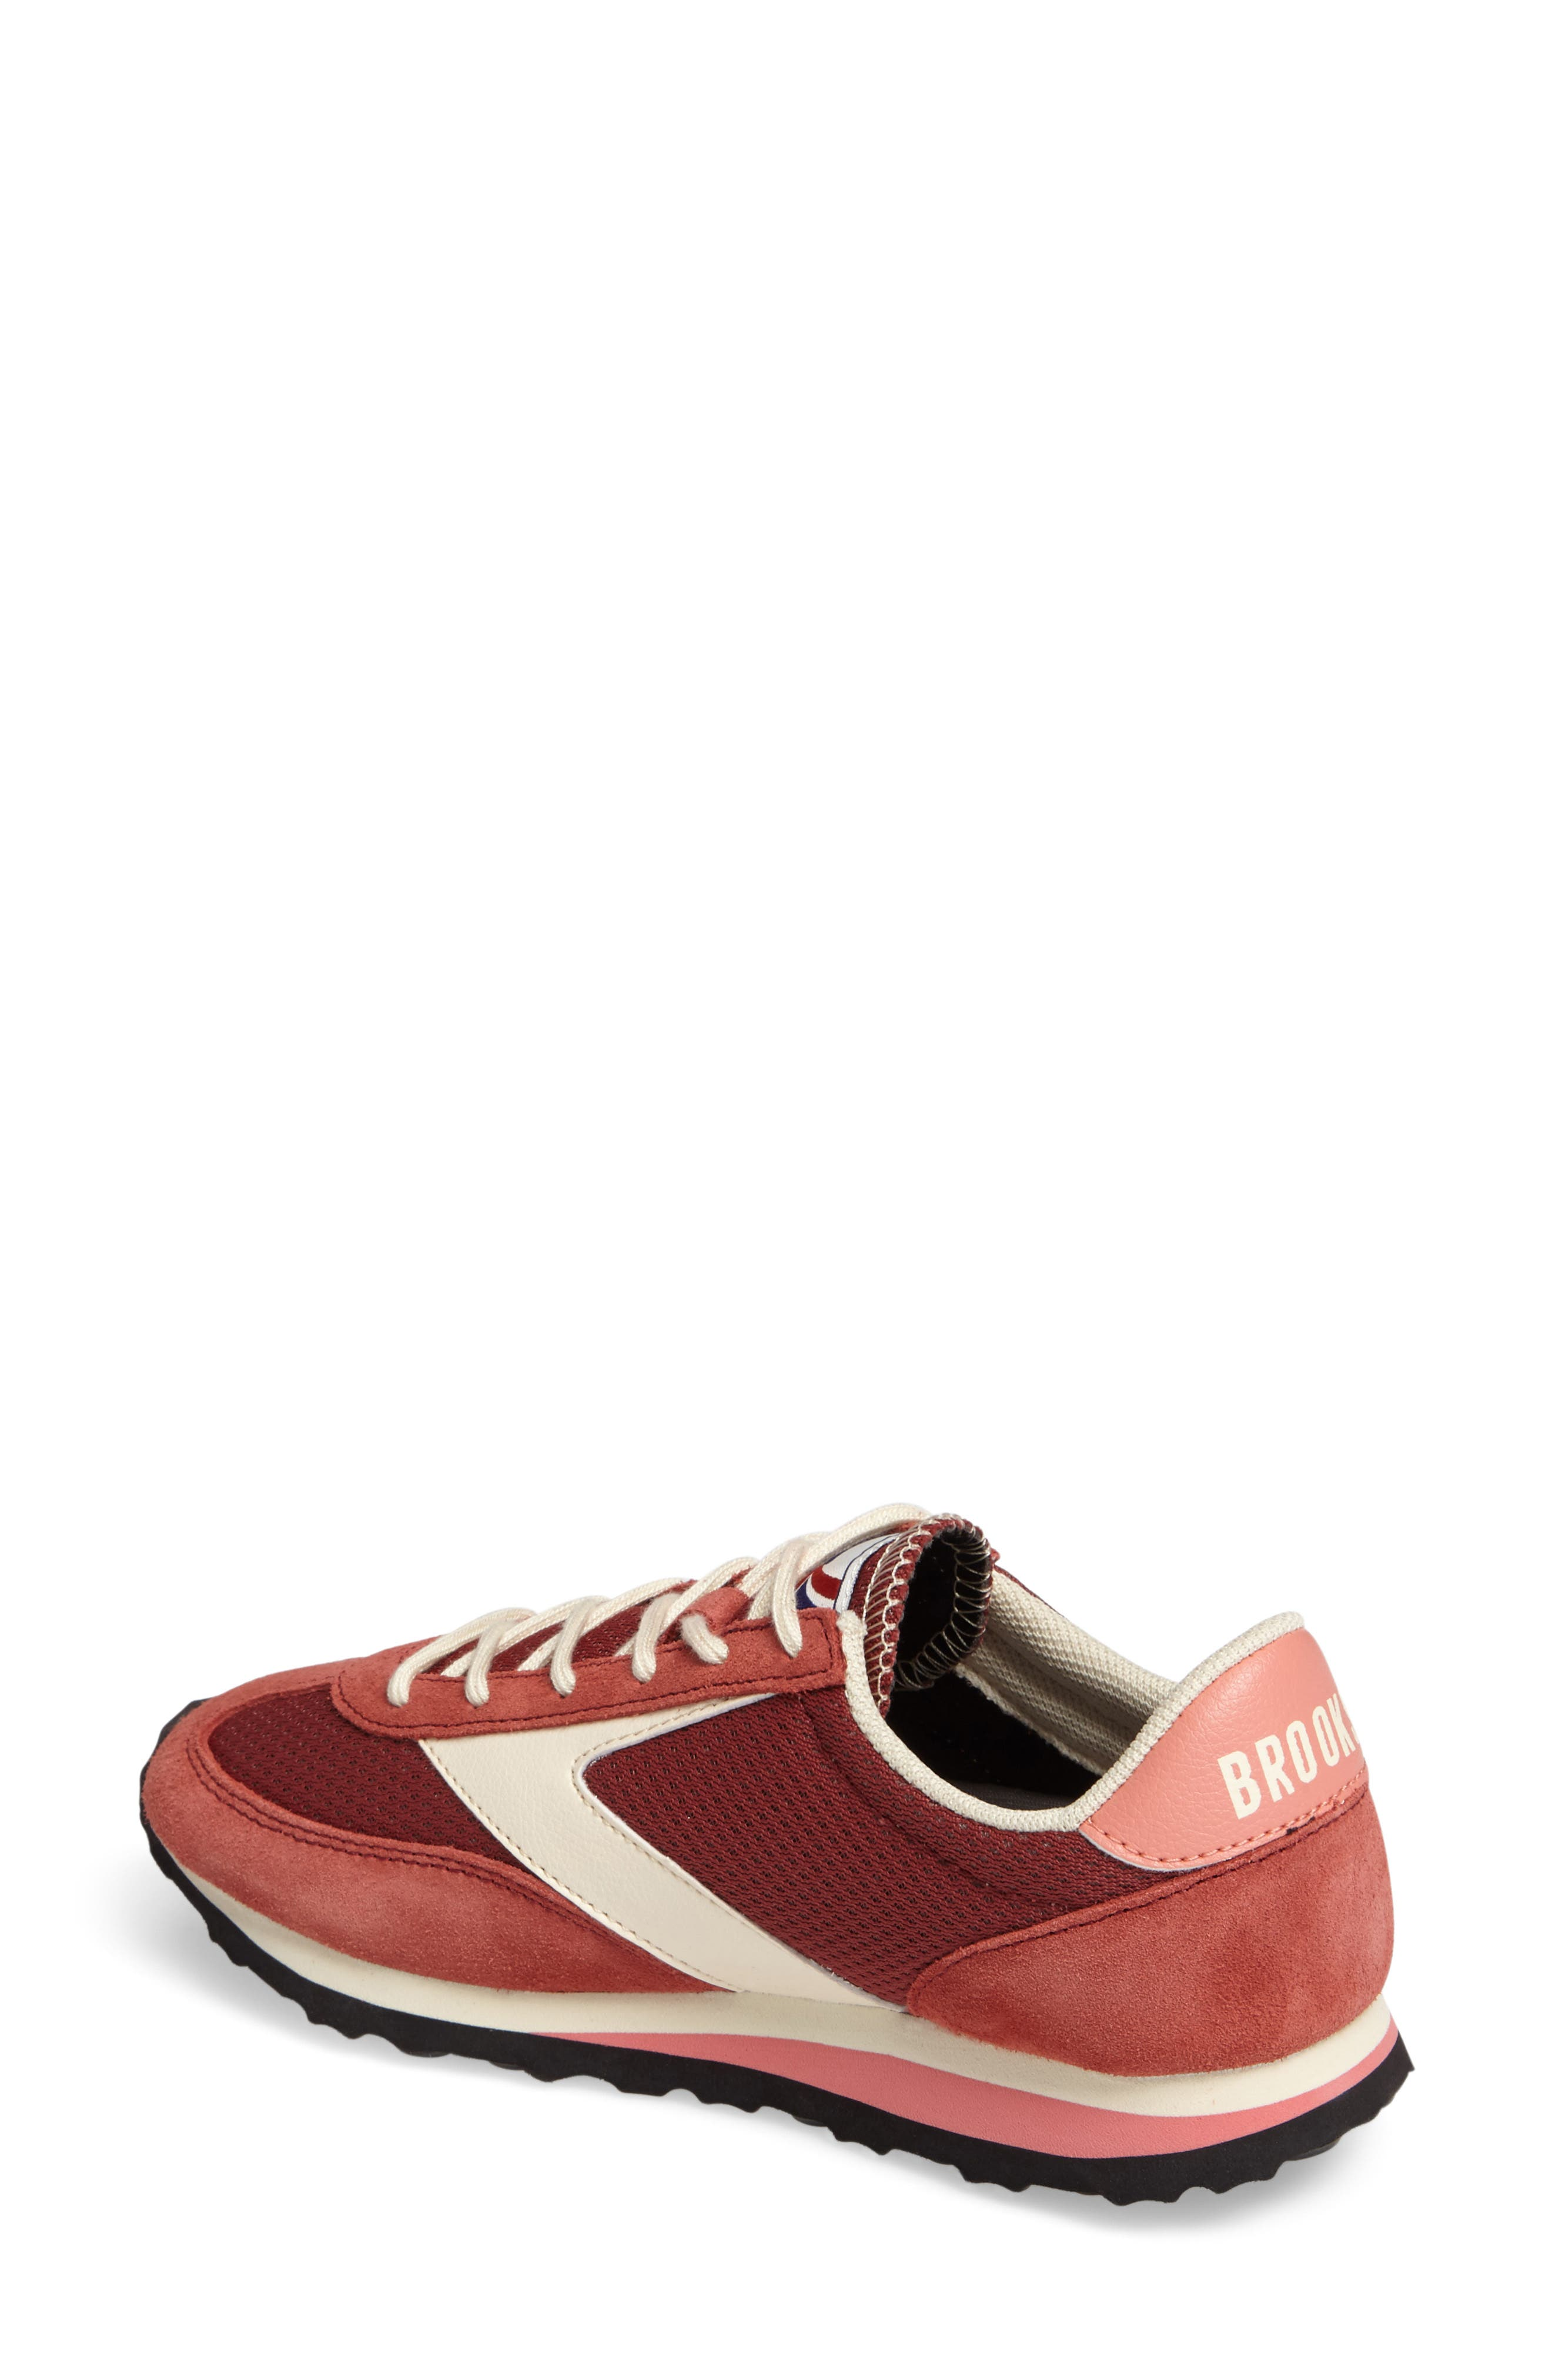 'Vanguard' Sneaker,                             Alternate thumbnail 87, color,